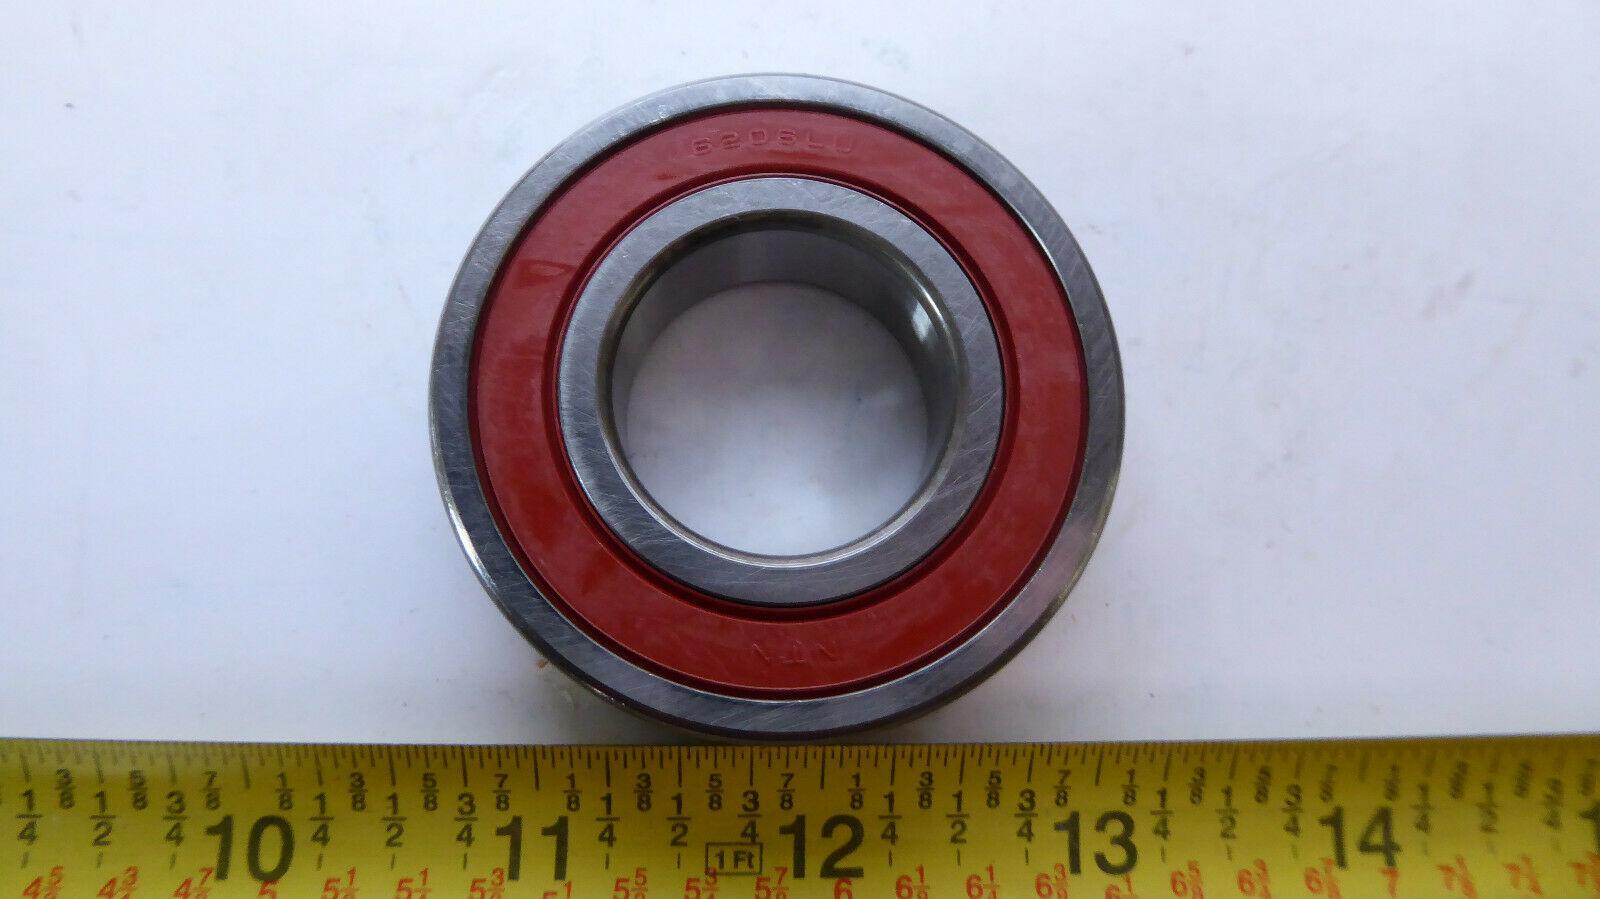 NTN 6206LLU C3/5C Sealed Roller Bearing New